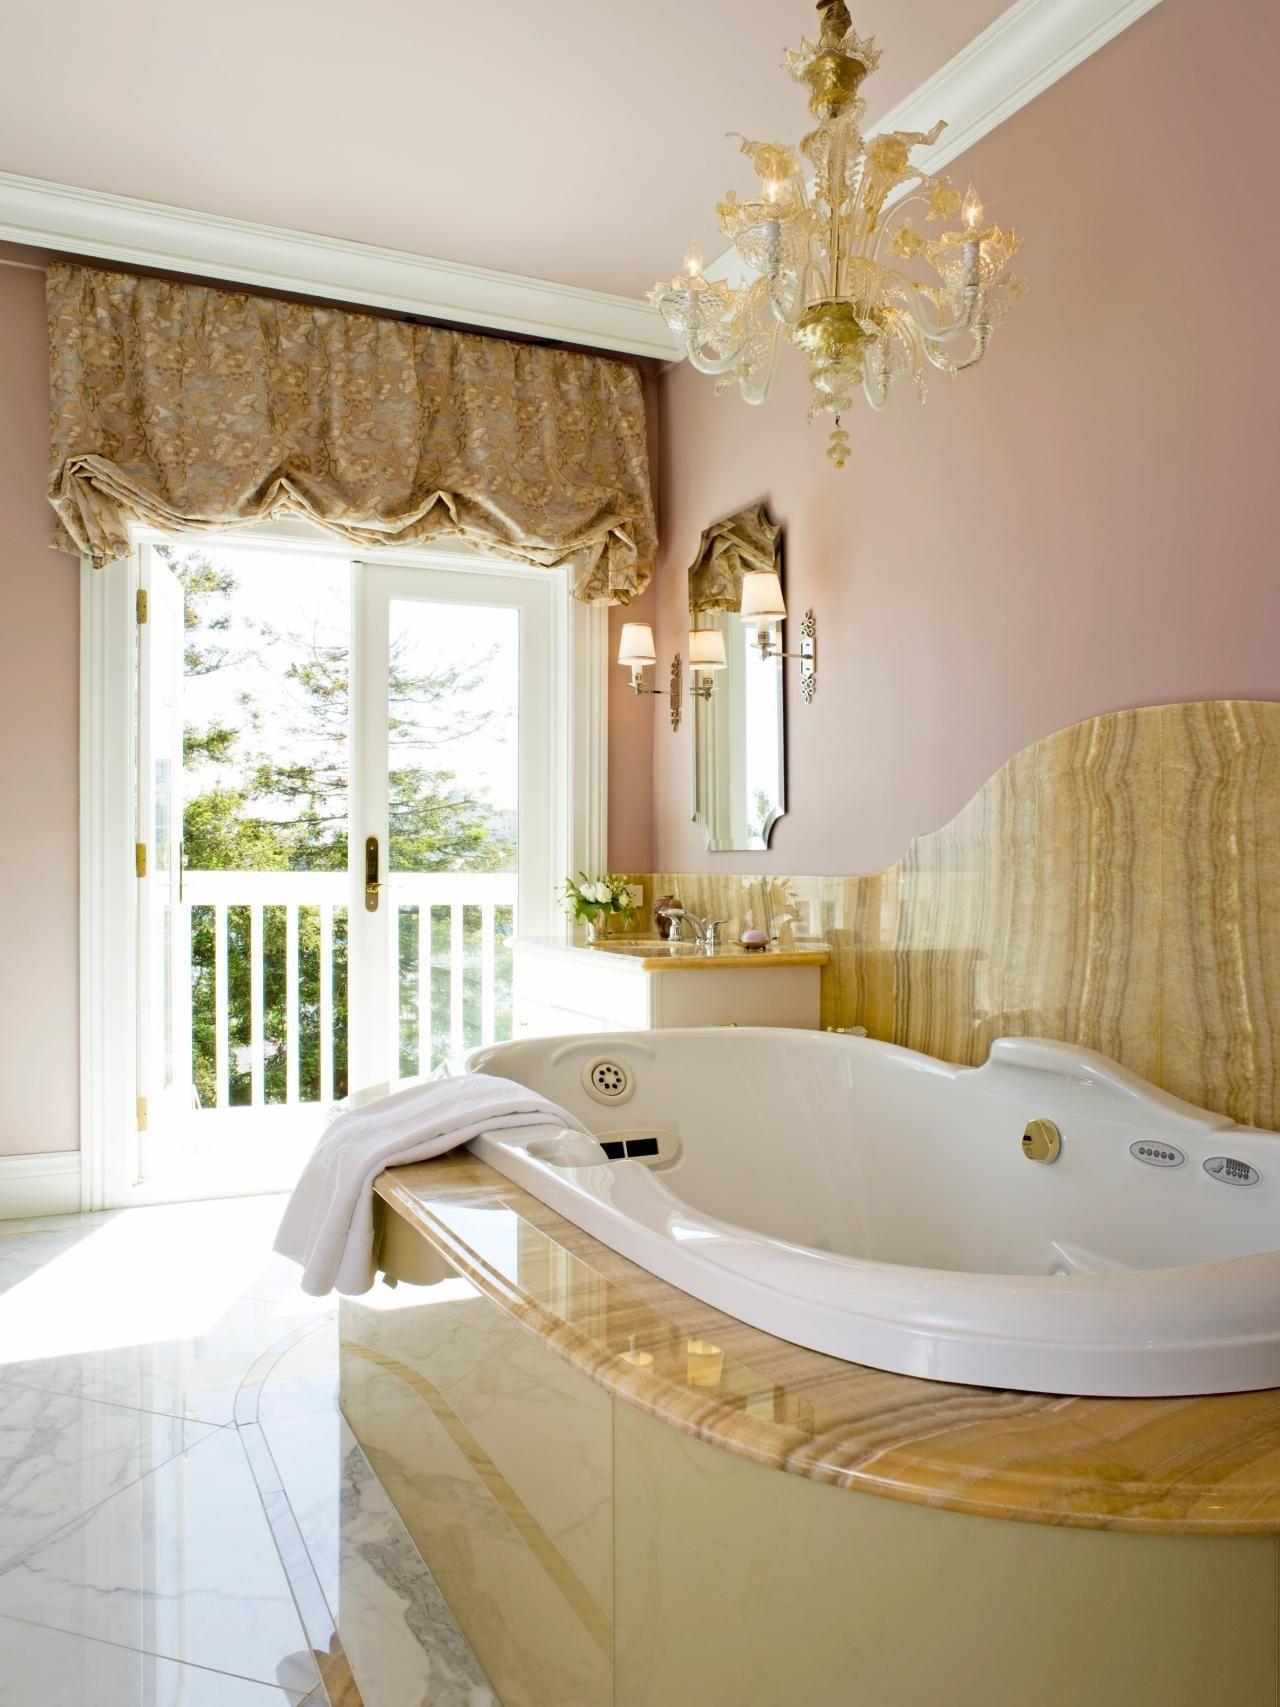 chandeliers bathroom pictures 99 stylish design ideas youu0027ll love bathroom ideas u0026 design